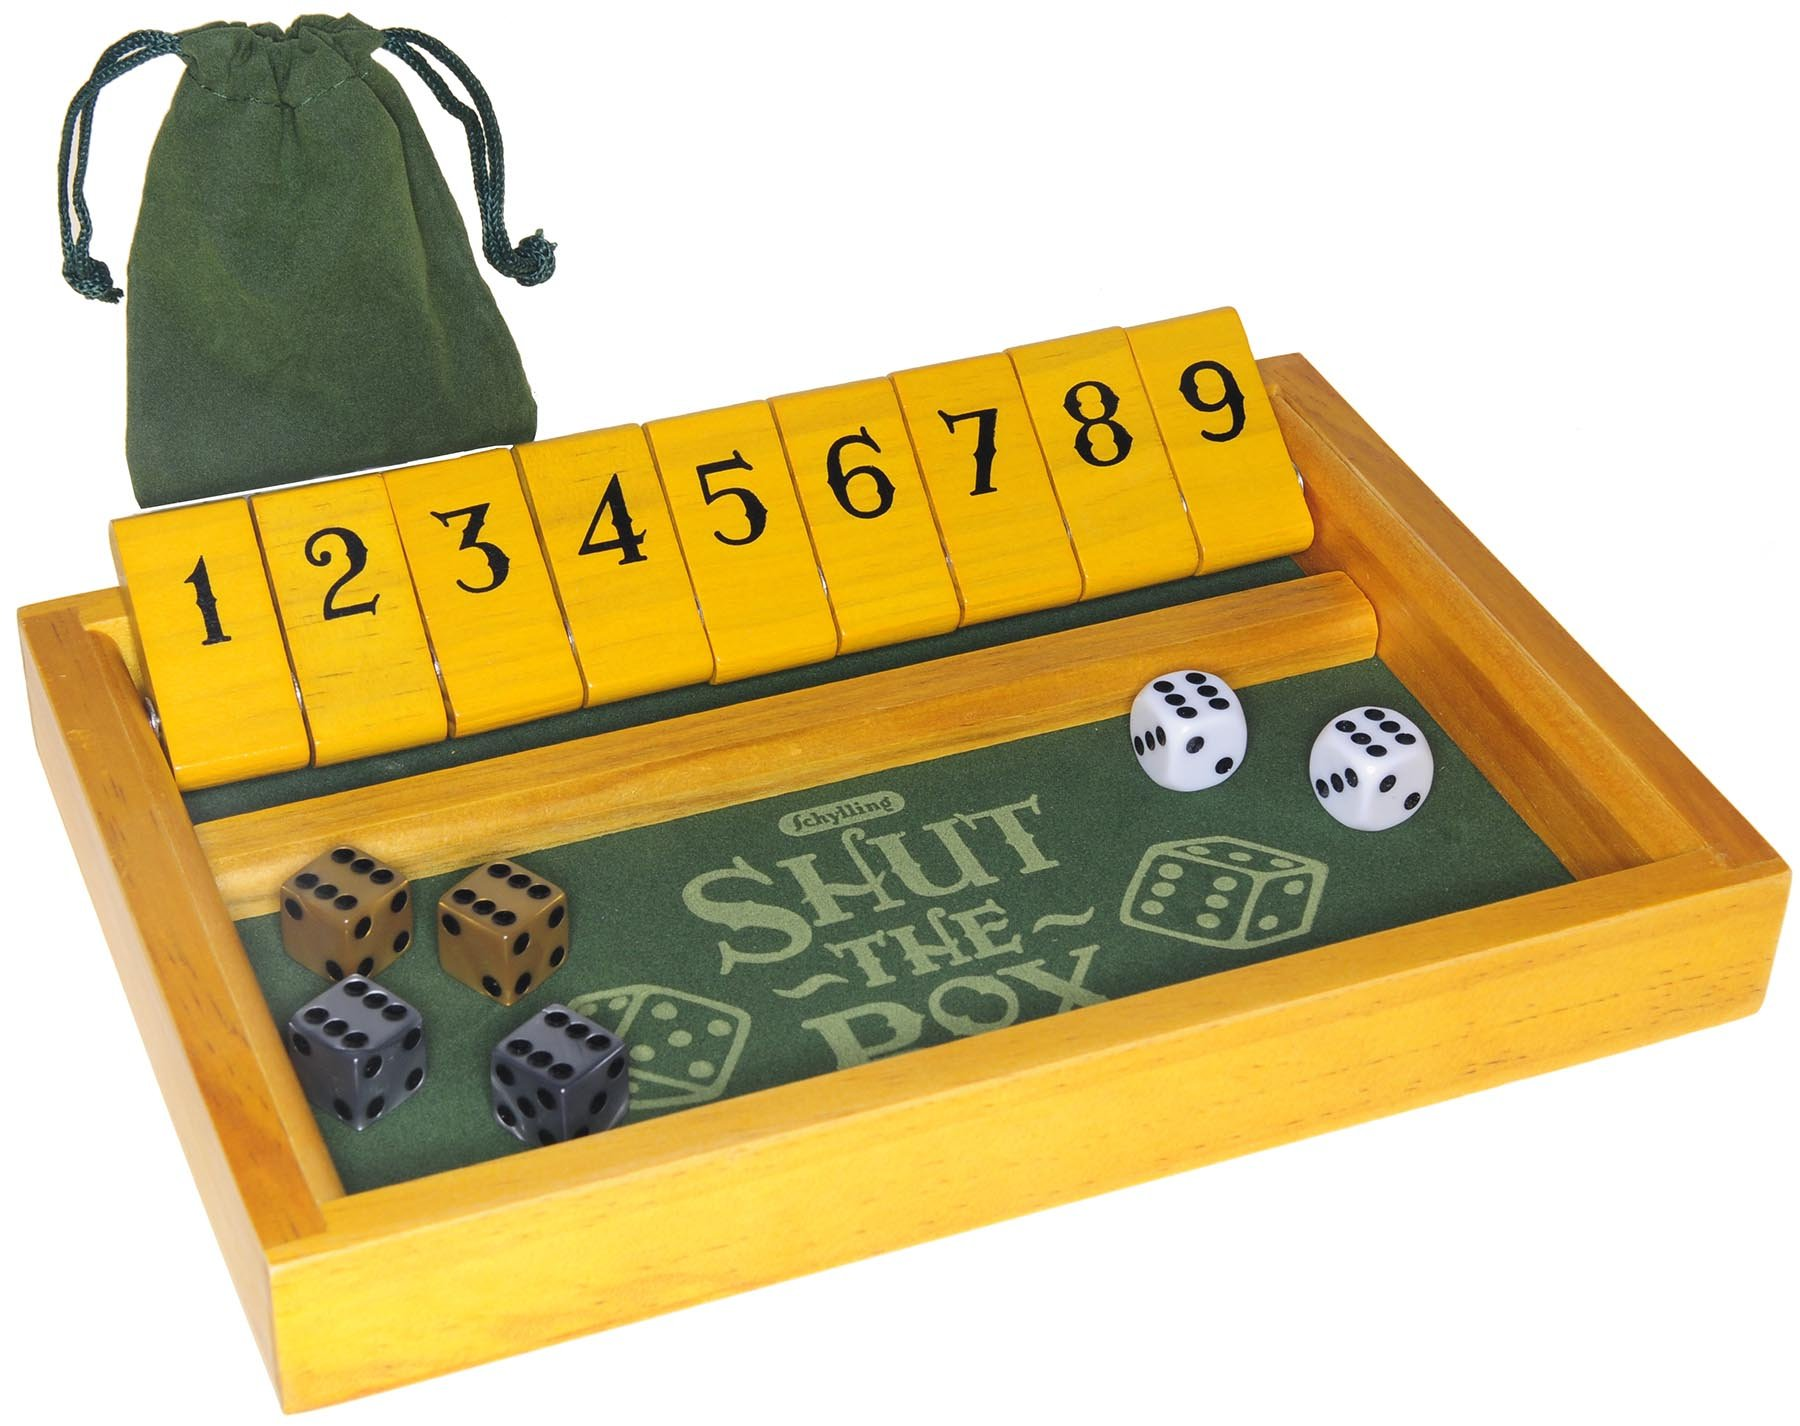 Shut the Box Wood Game _ Bonus 2 Gold Swirl D6, and 2 Silver Swirl D6 16mm Game Dice _ Bundled Items